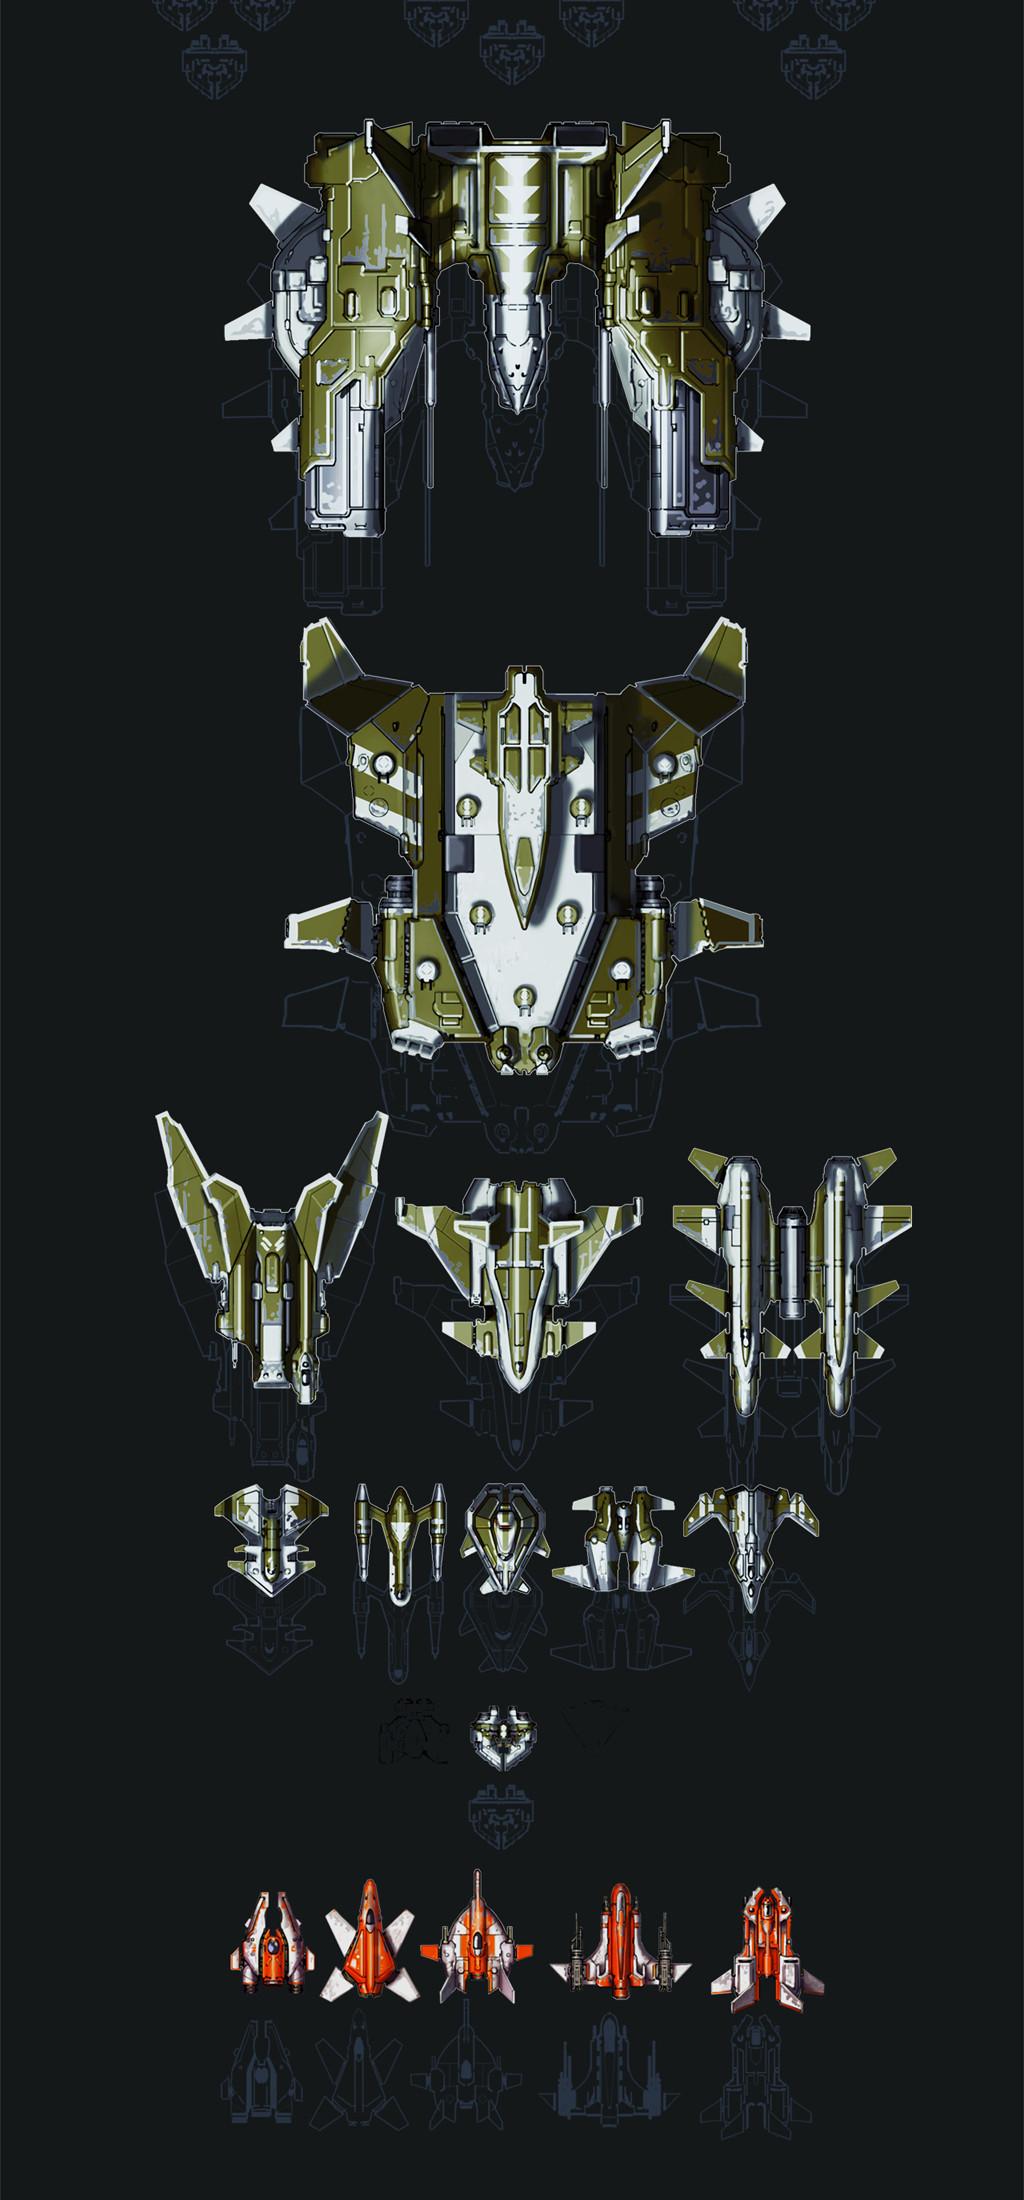 Jaroslaw marcinek spaceships v3